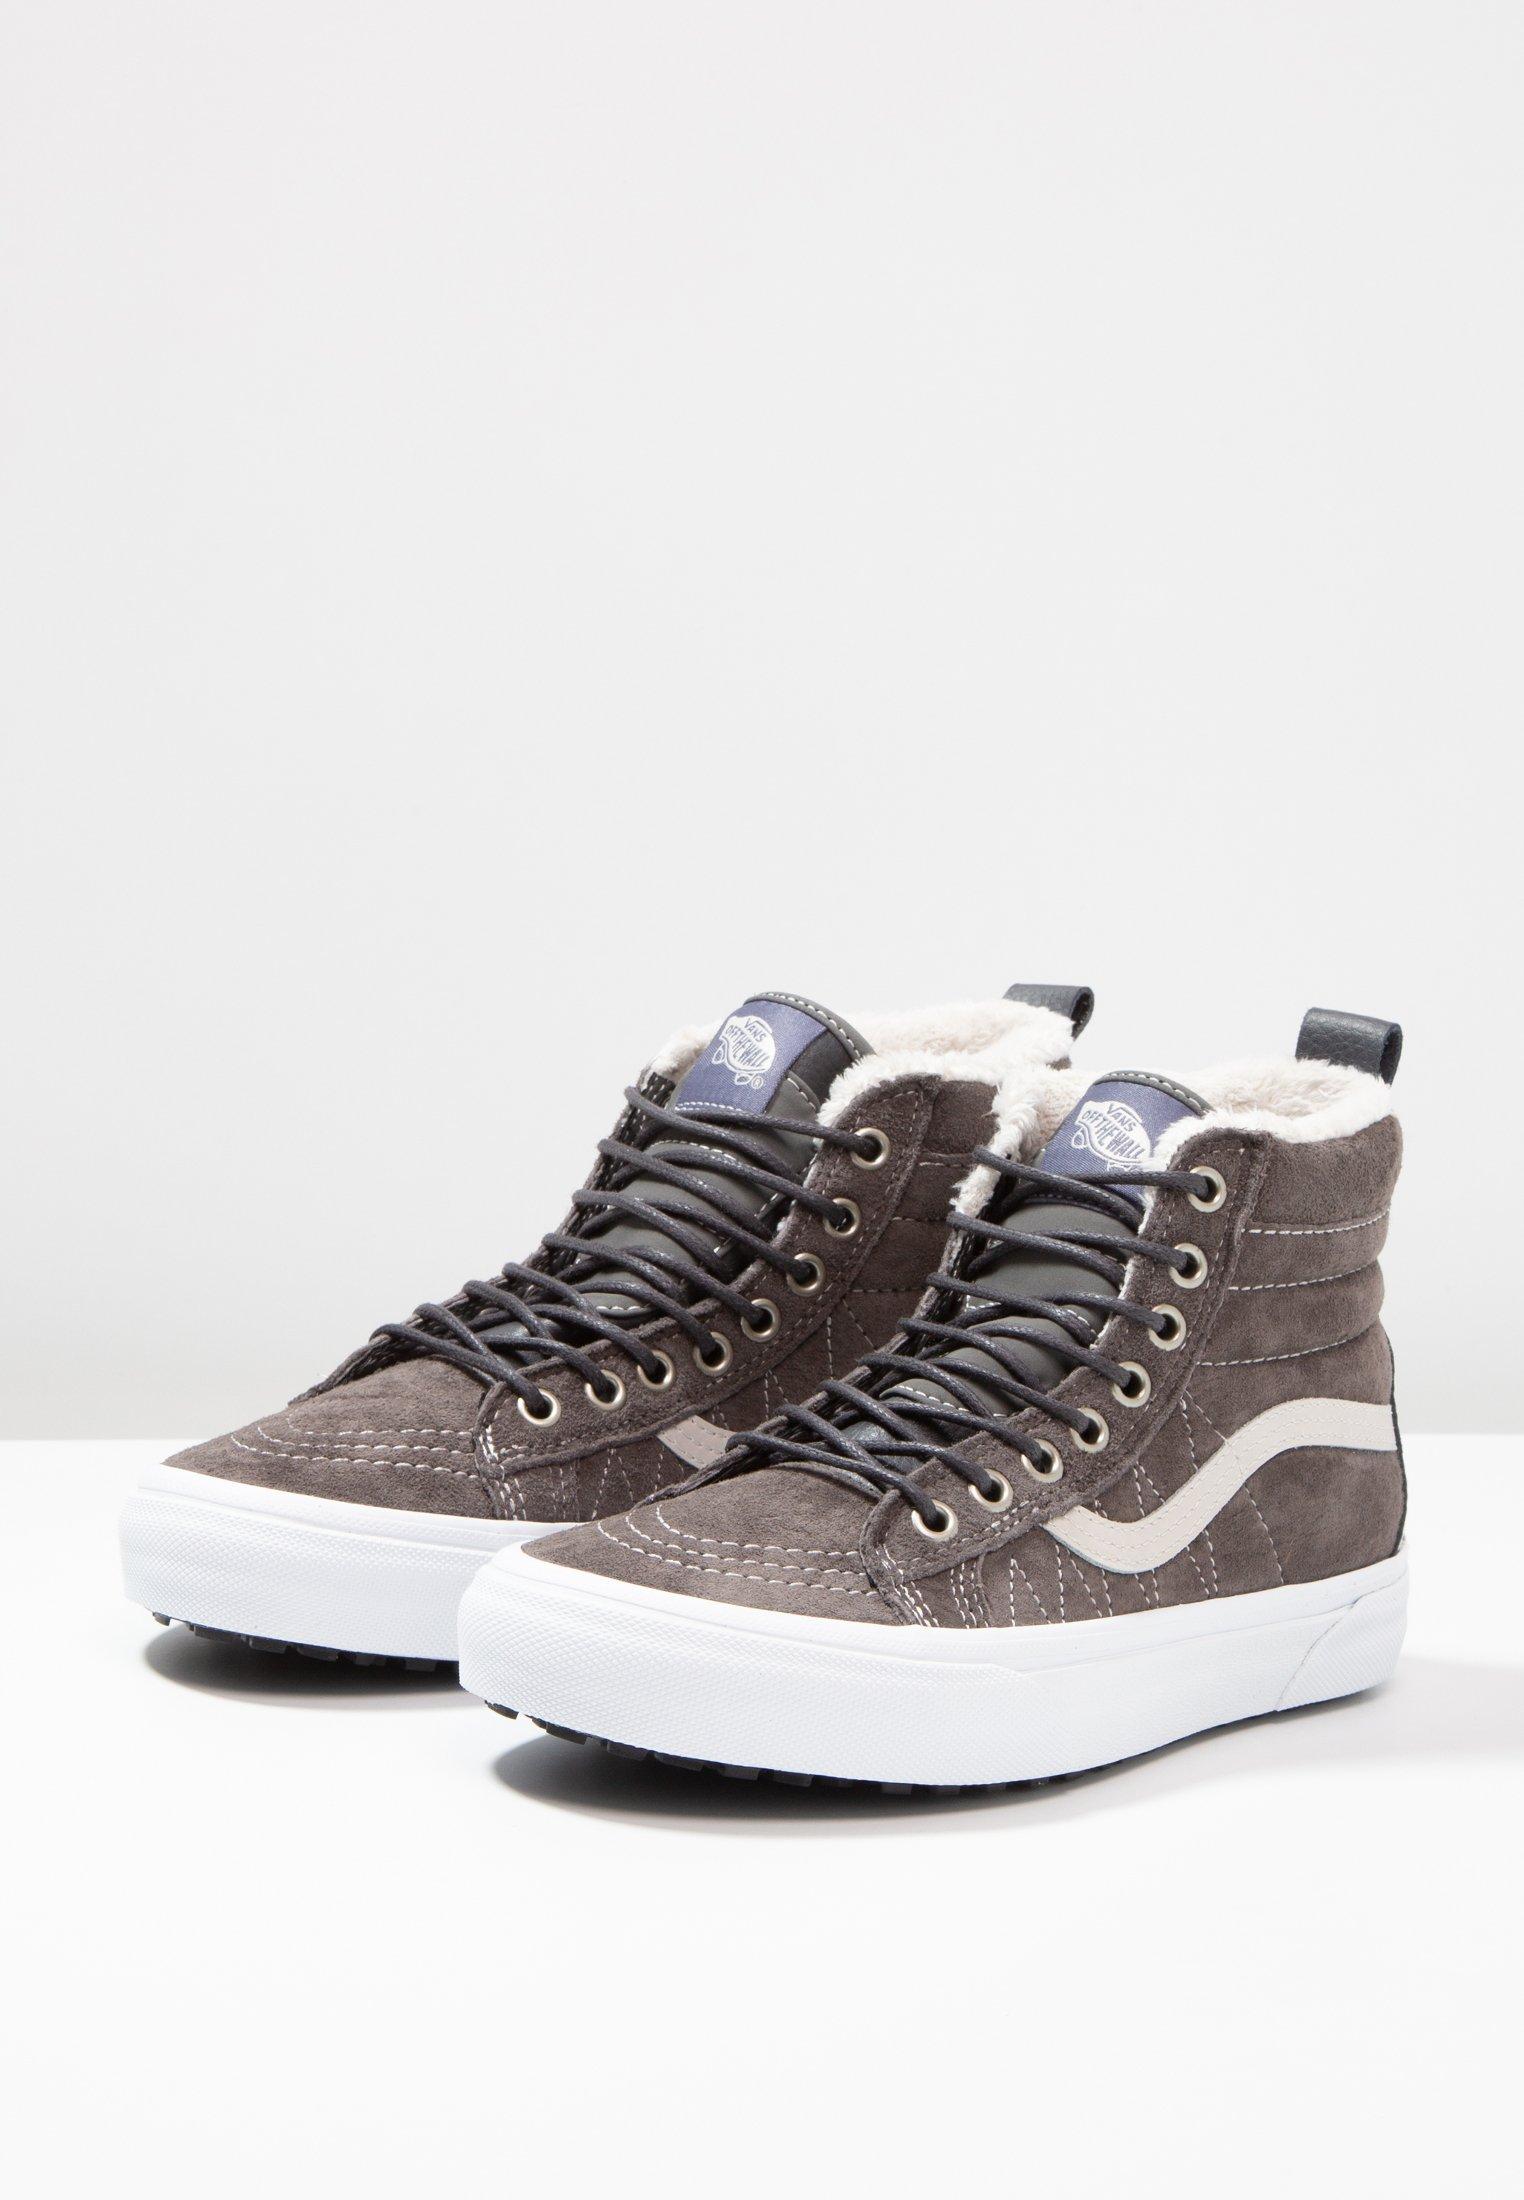 SK8 HI MTE Sneakers alte grey